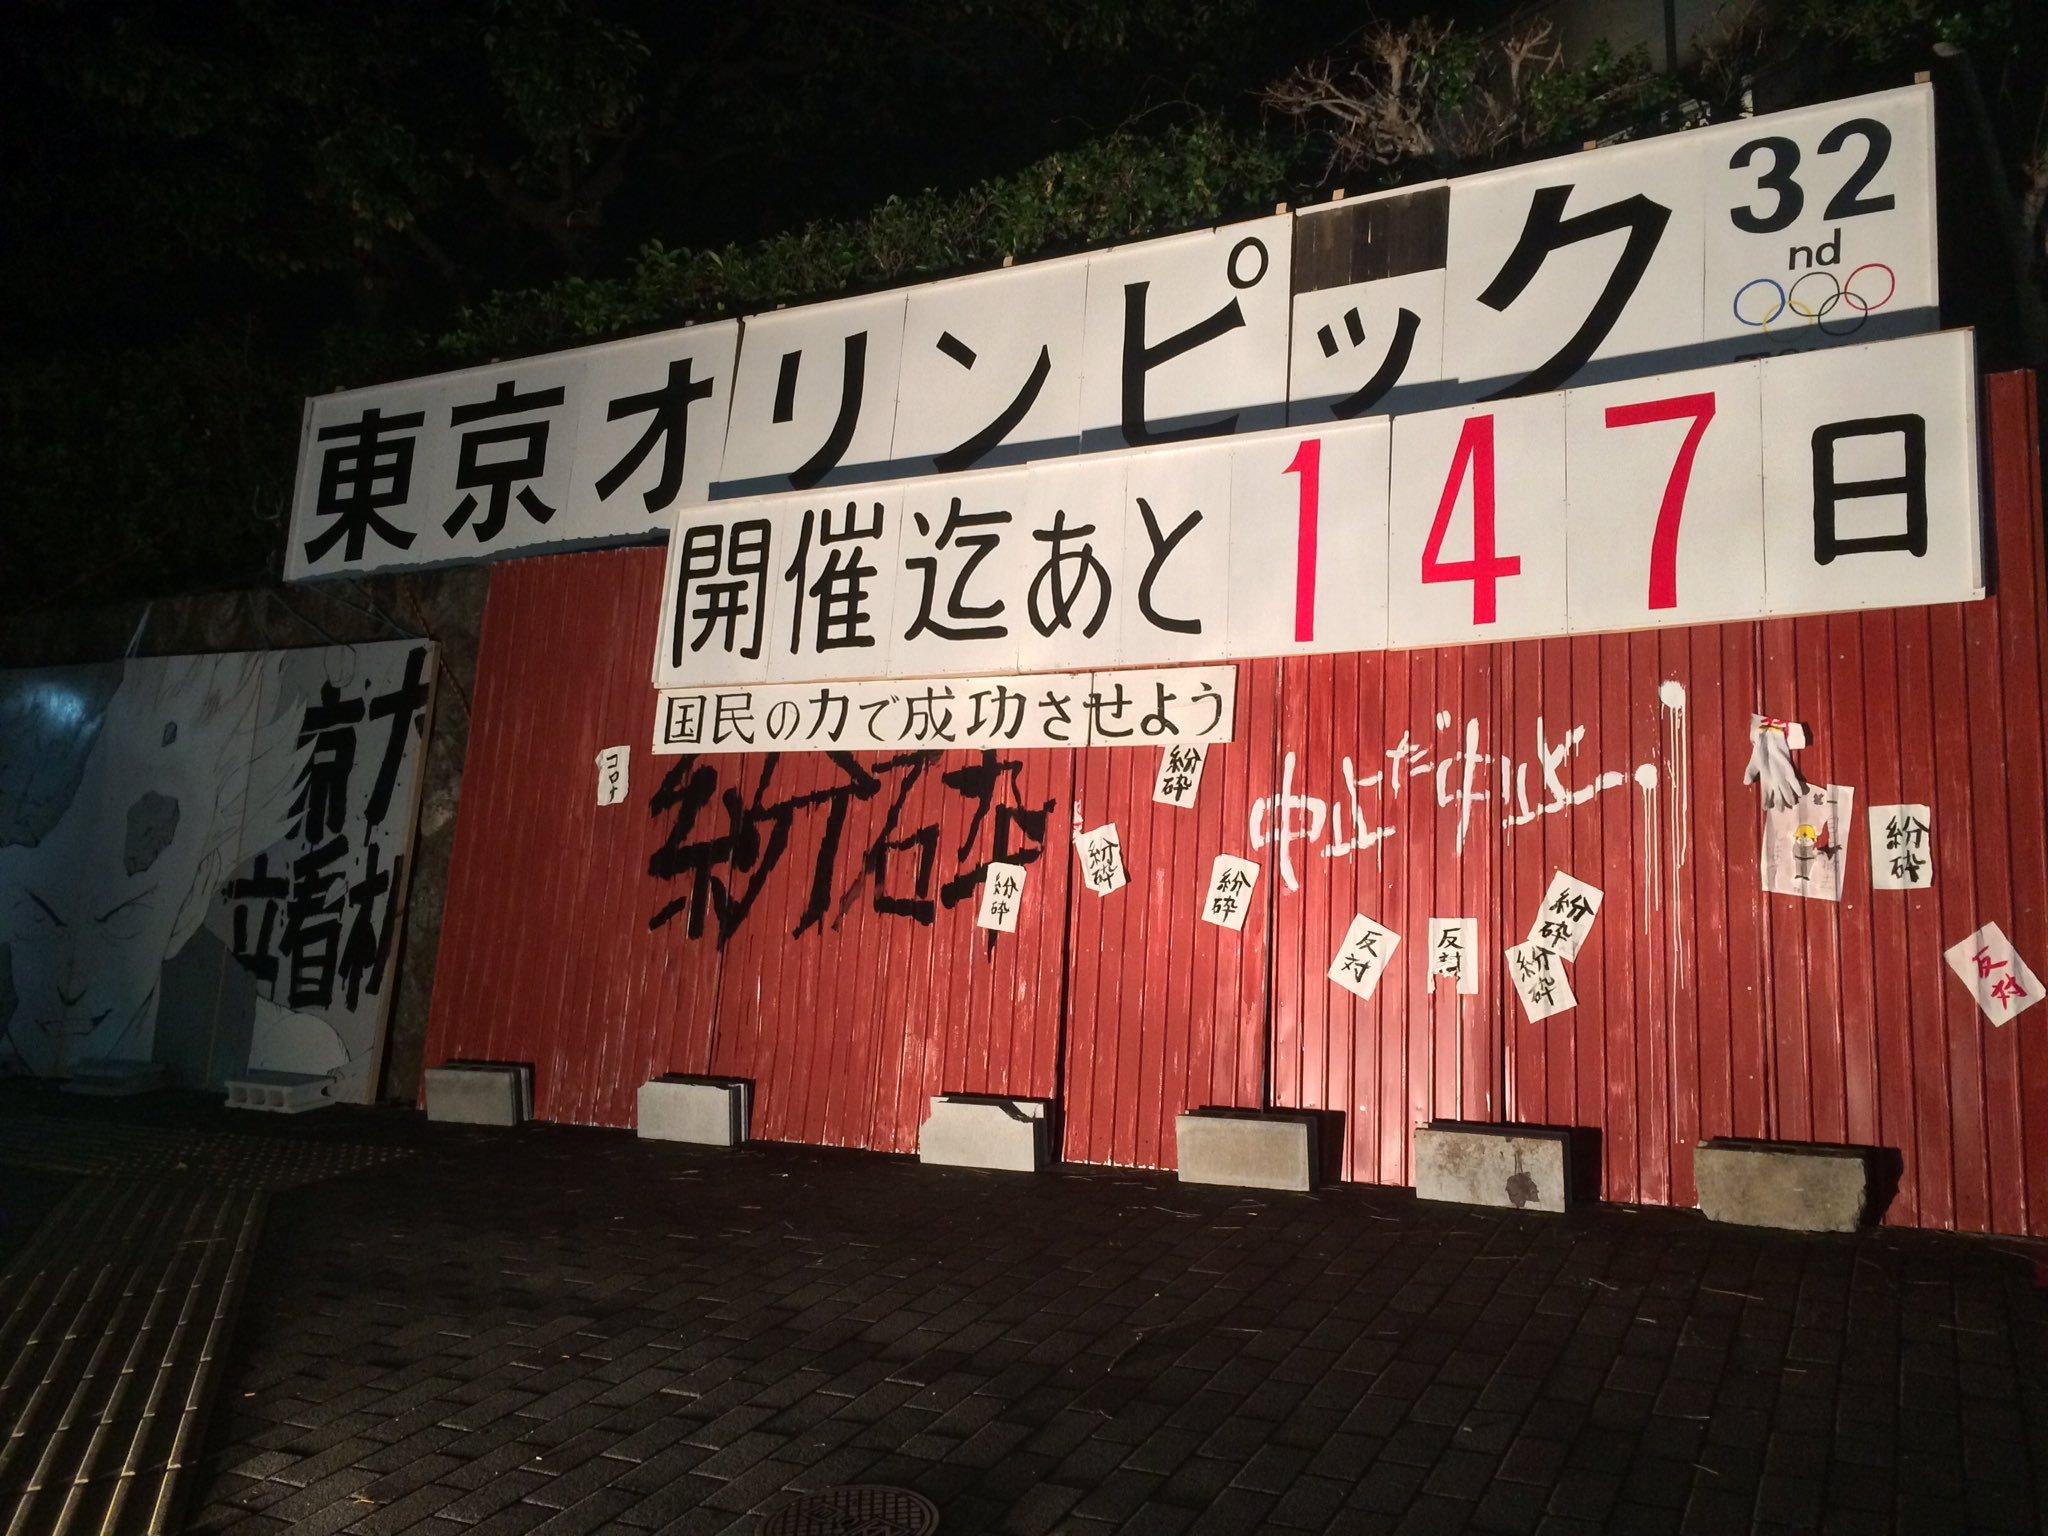 AKIRA 东京奥运会 倒计时 名梗